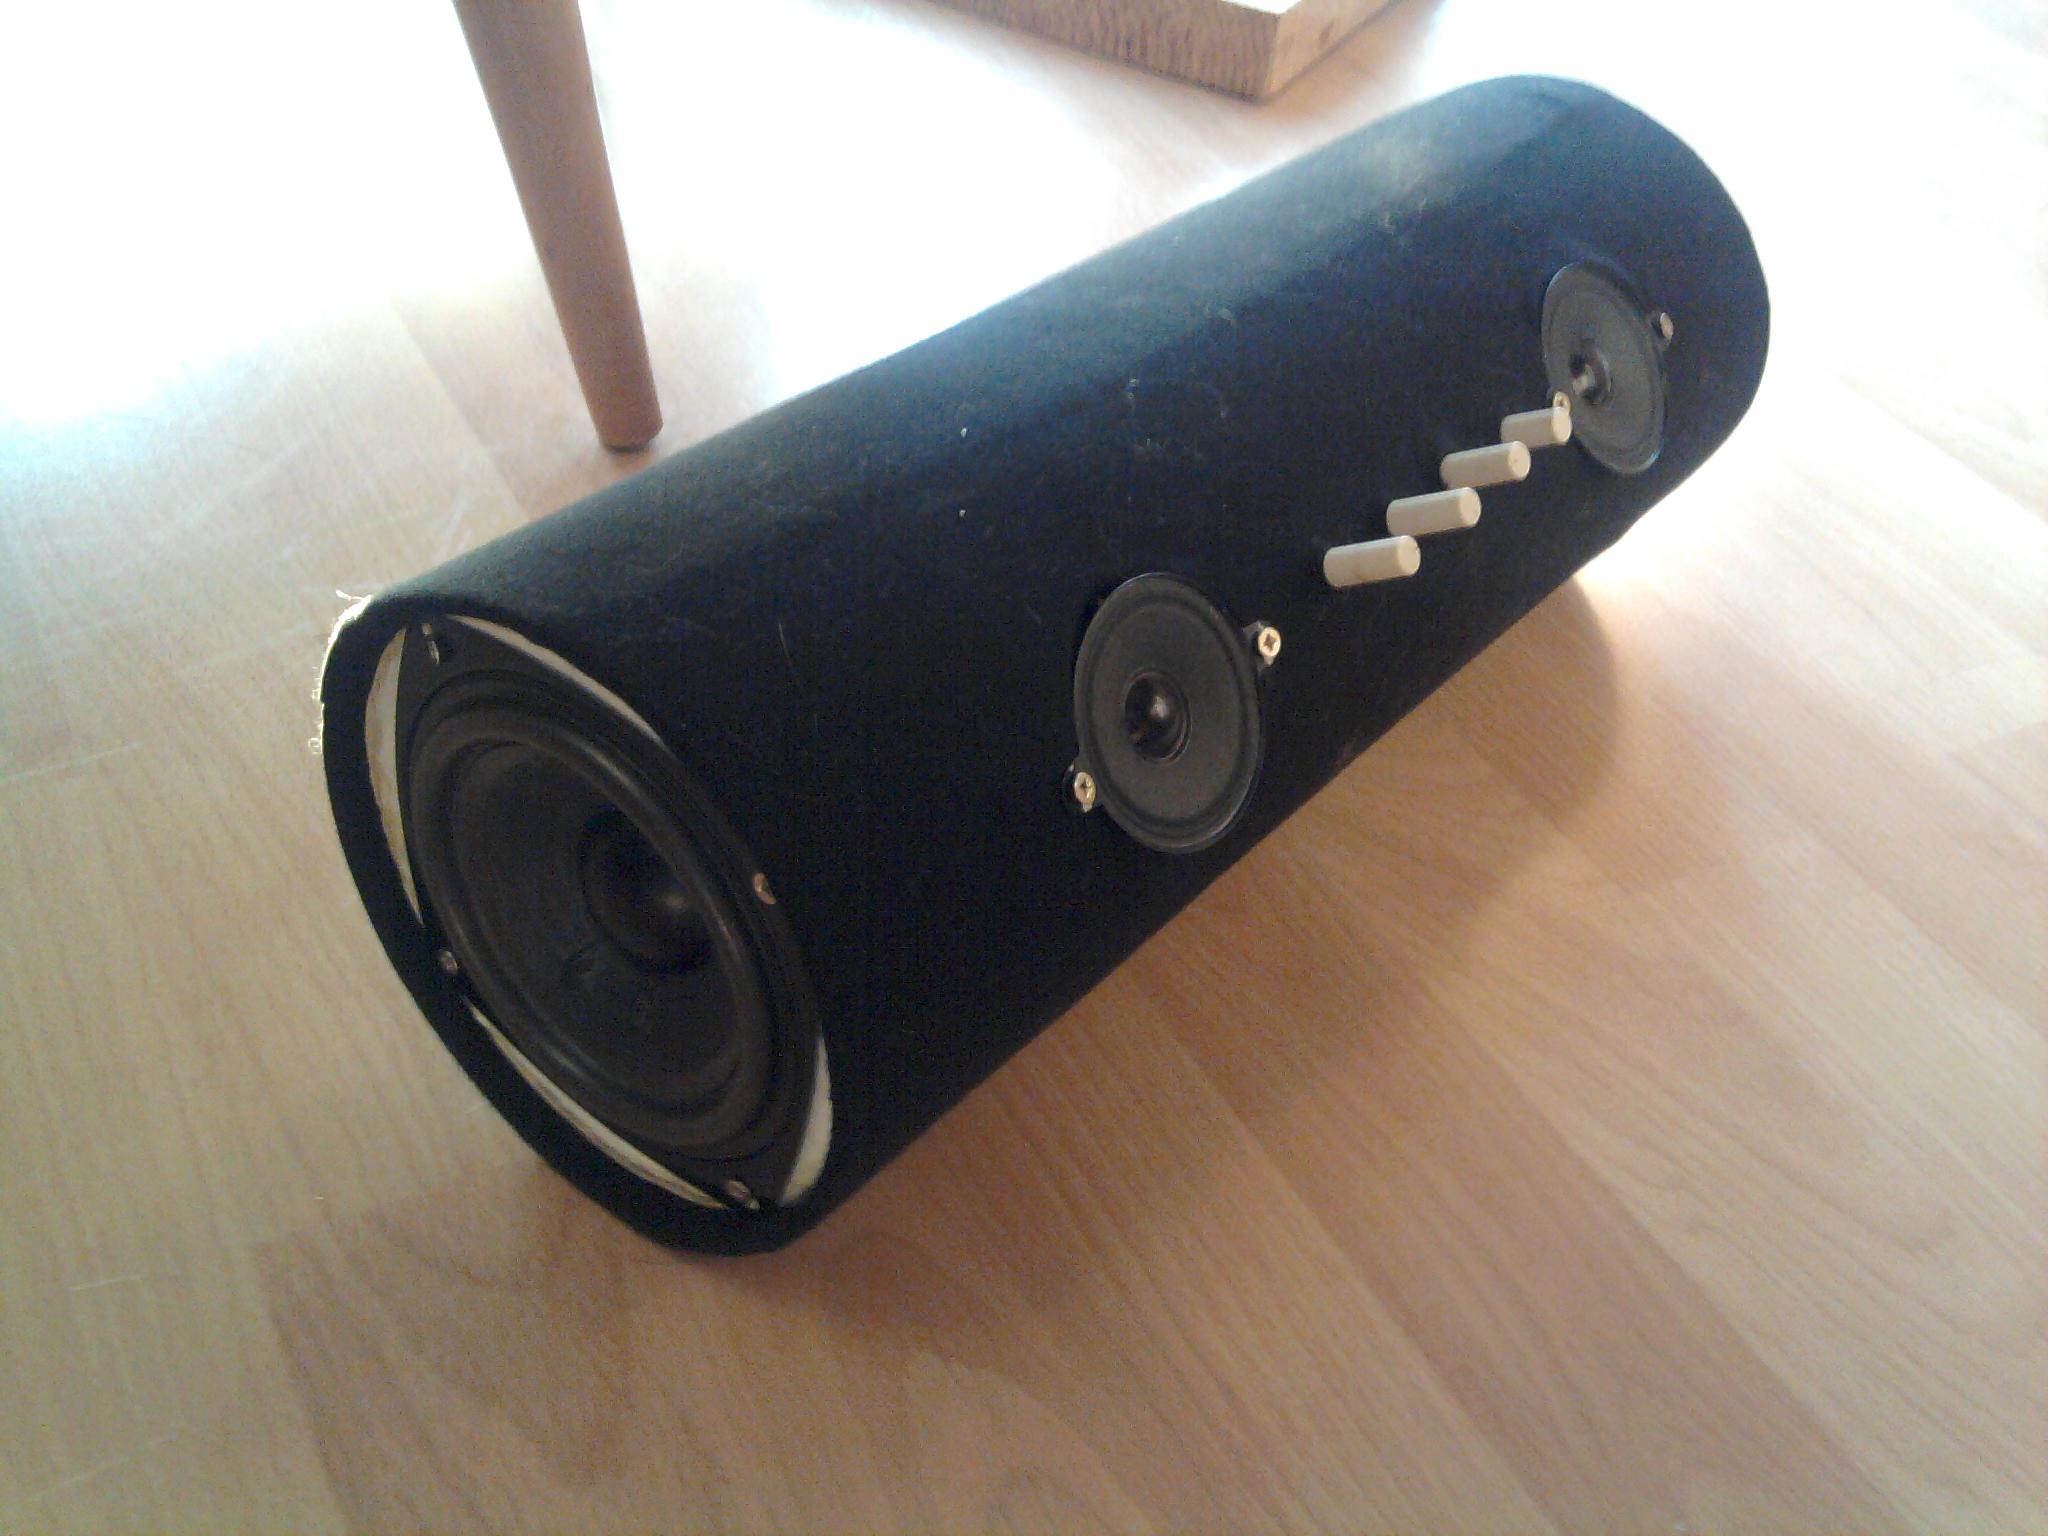 Awsome speaker tube from old computer speakers